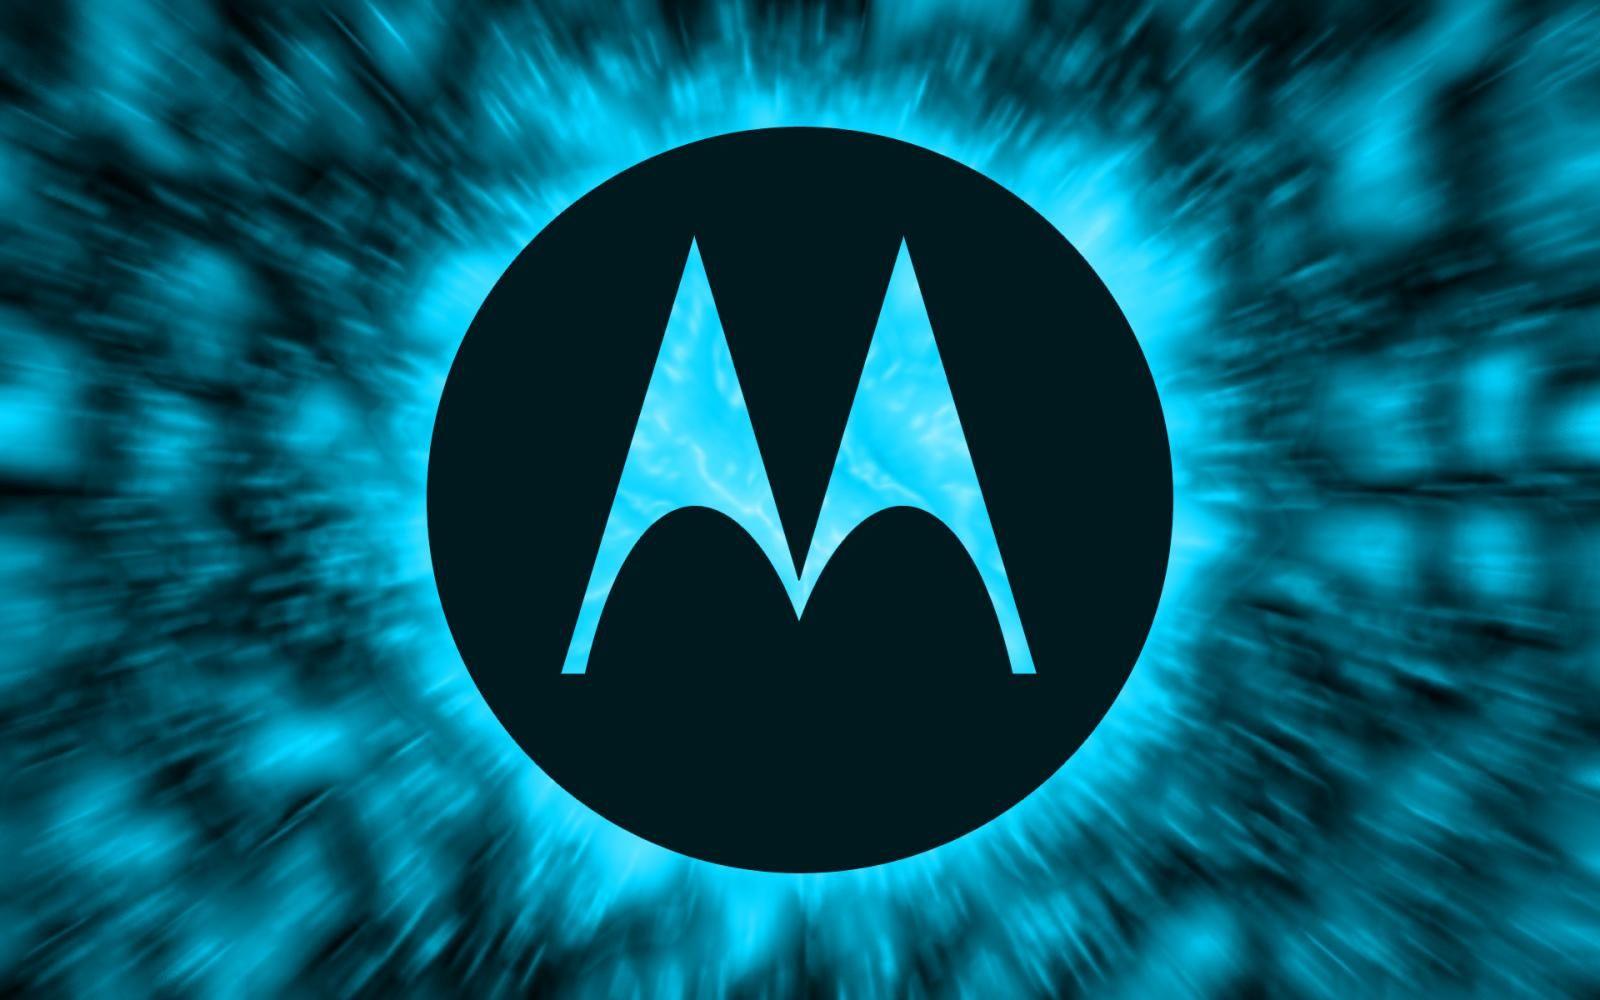 Cool Motorola Logo Crackberry Com Motorola Wallpapers Motorola Logos